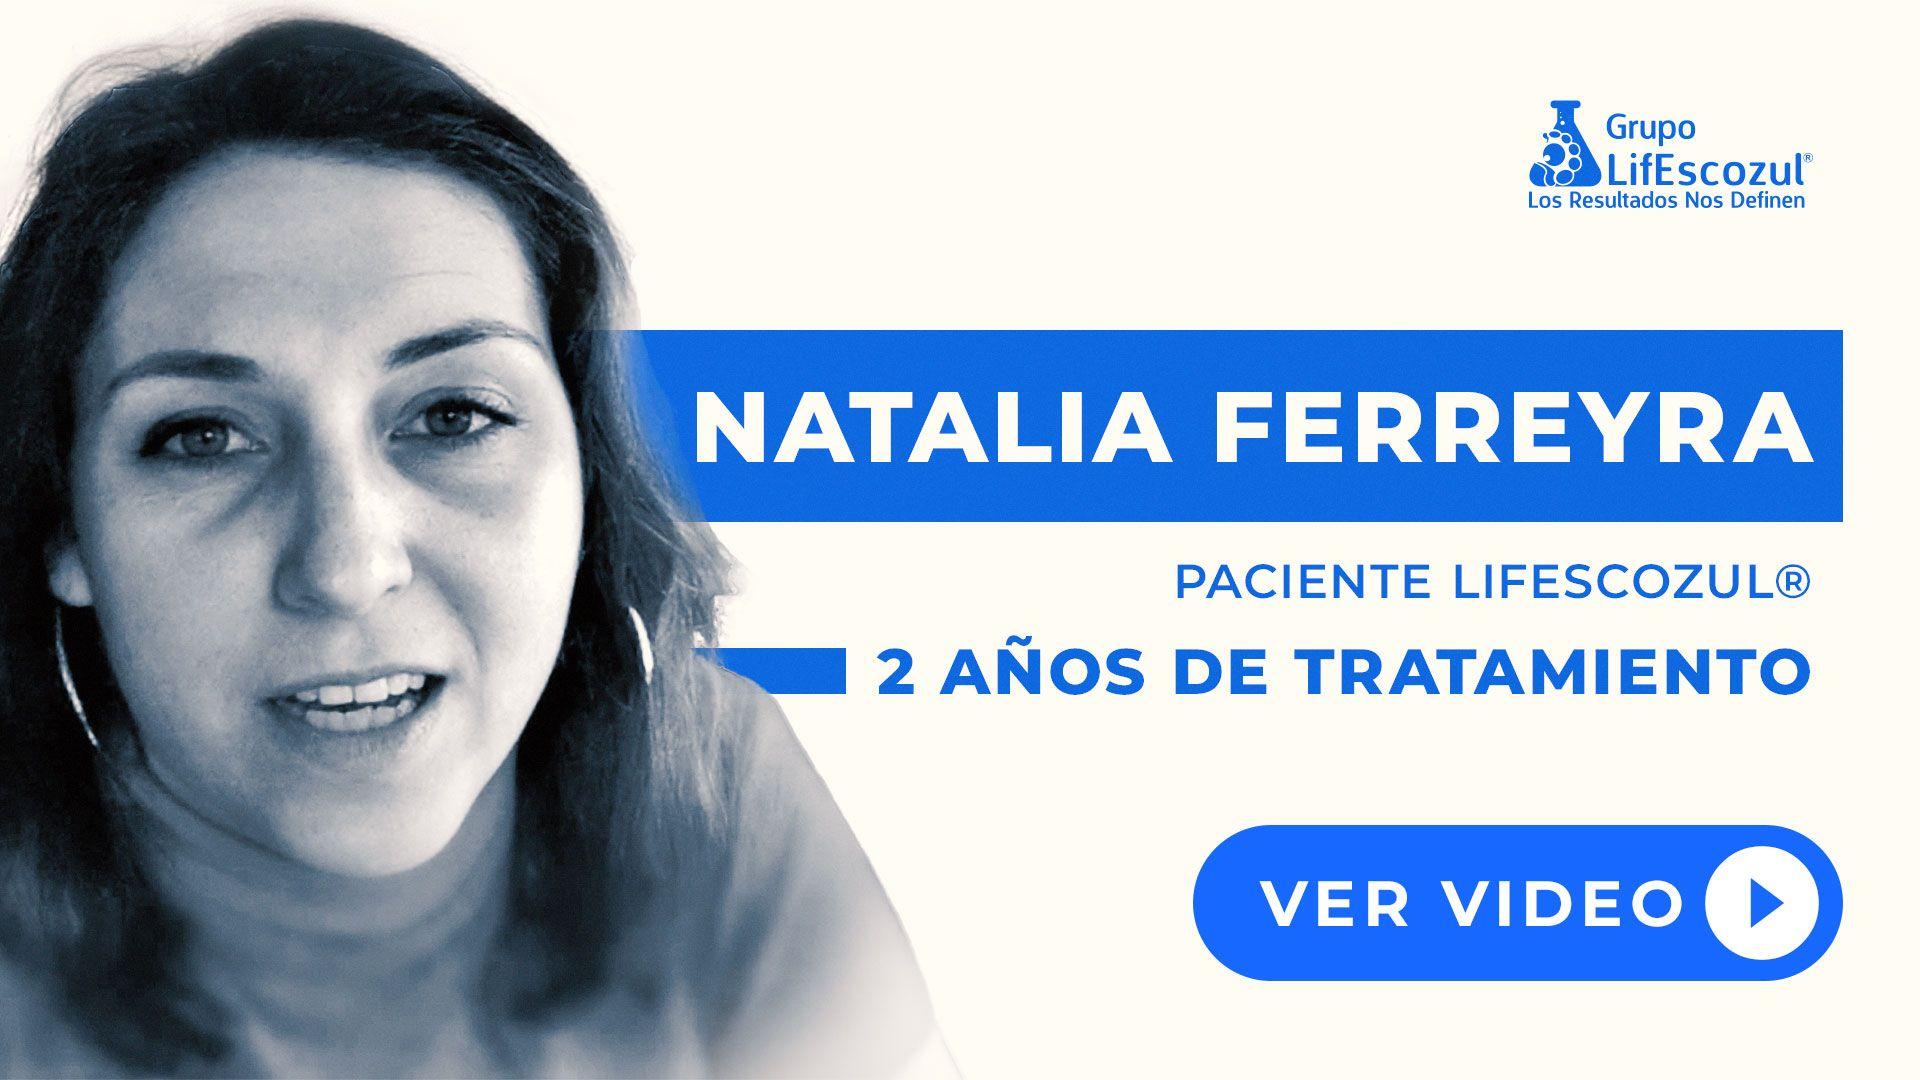 Natalia Ferreyra - Cáncer de Mama - Resultados con LifEscozul®